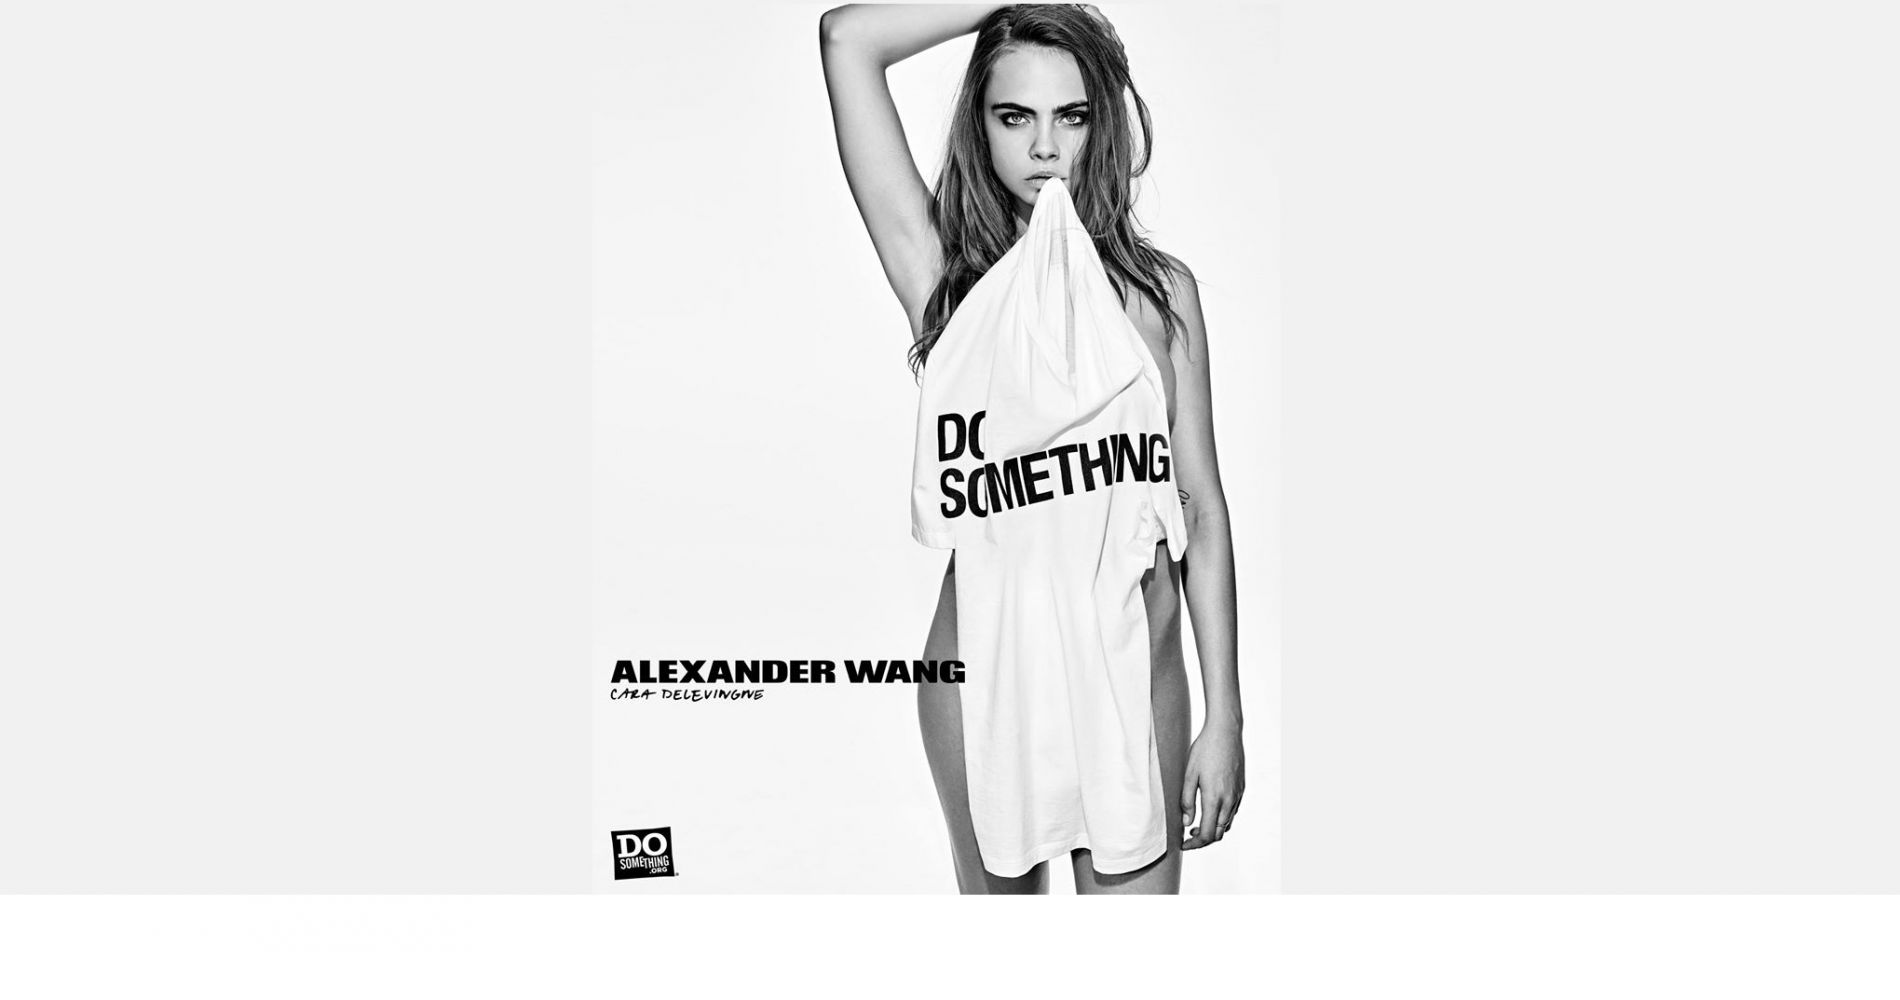 Alexander Wang x DoSomething : 38 stars jouent les égéries